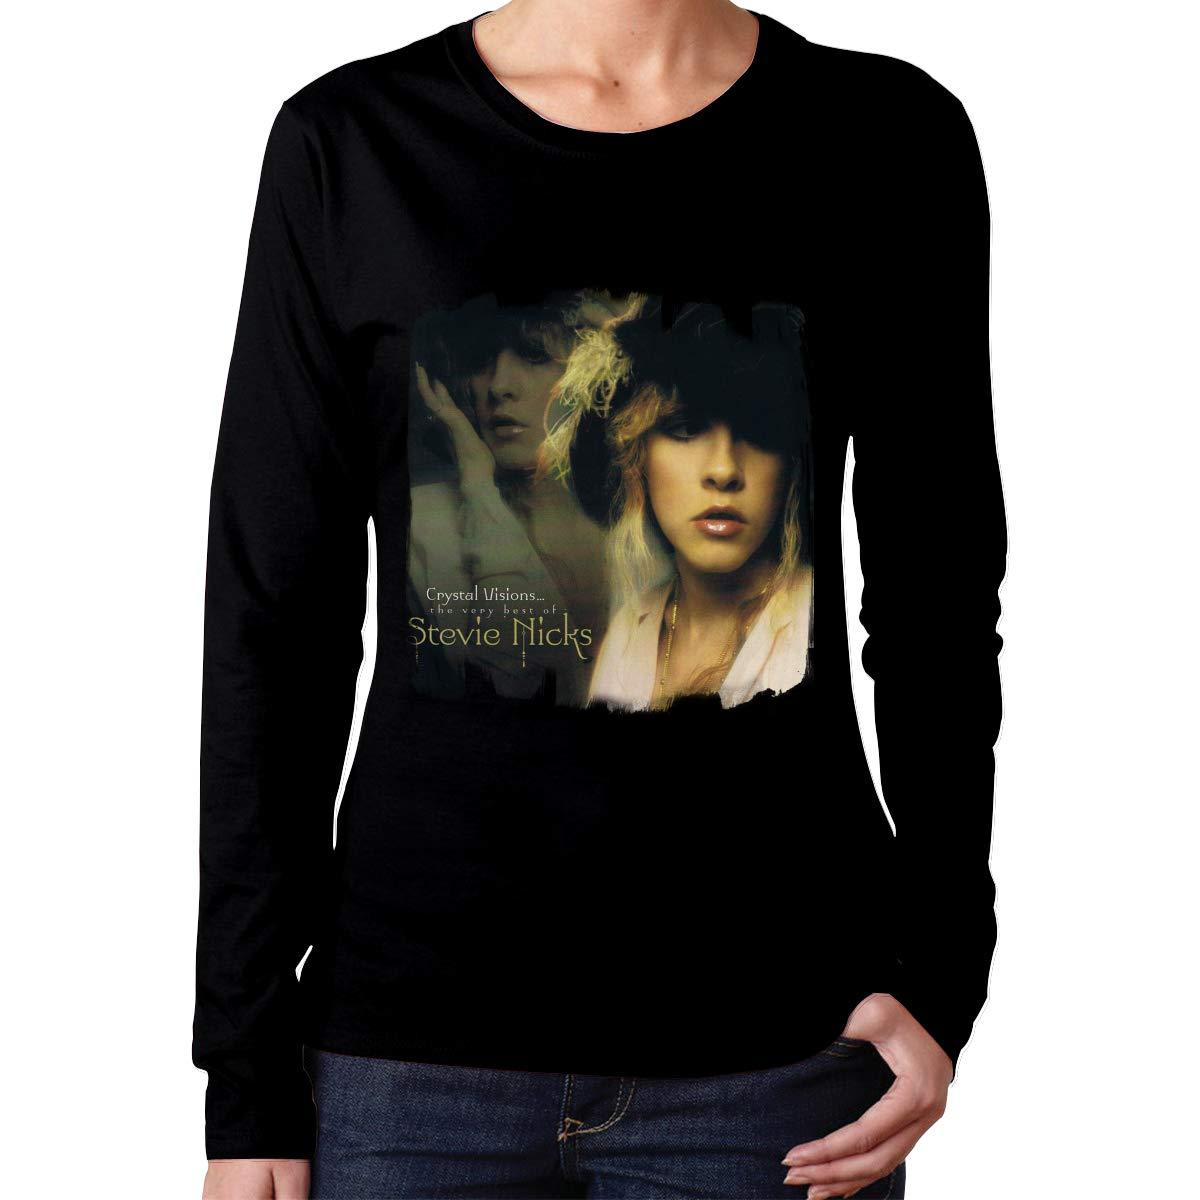 Stevie Nicks Crystal Visions Classic Music Band Fans S T Shirt Black Gif